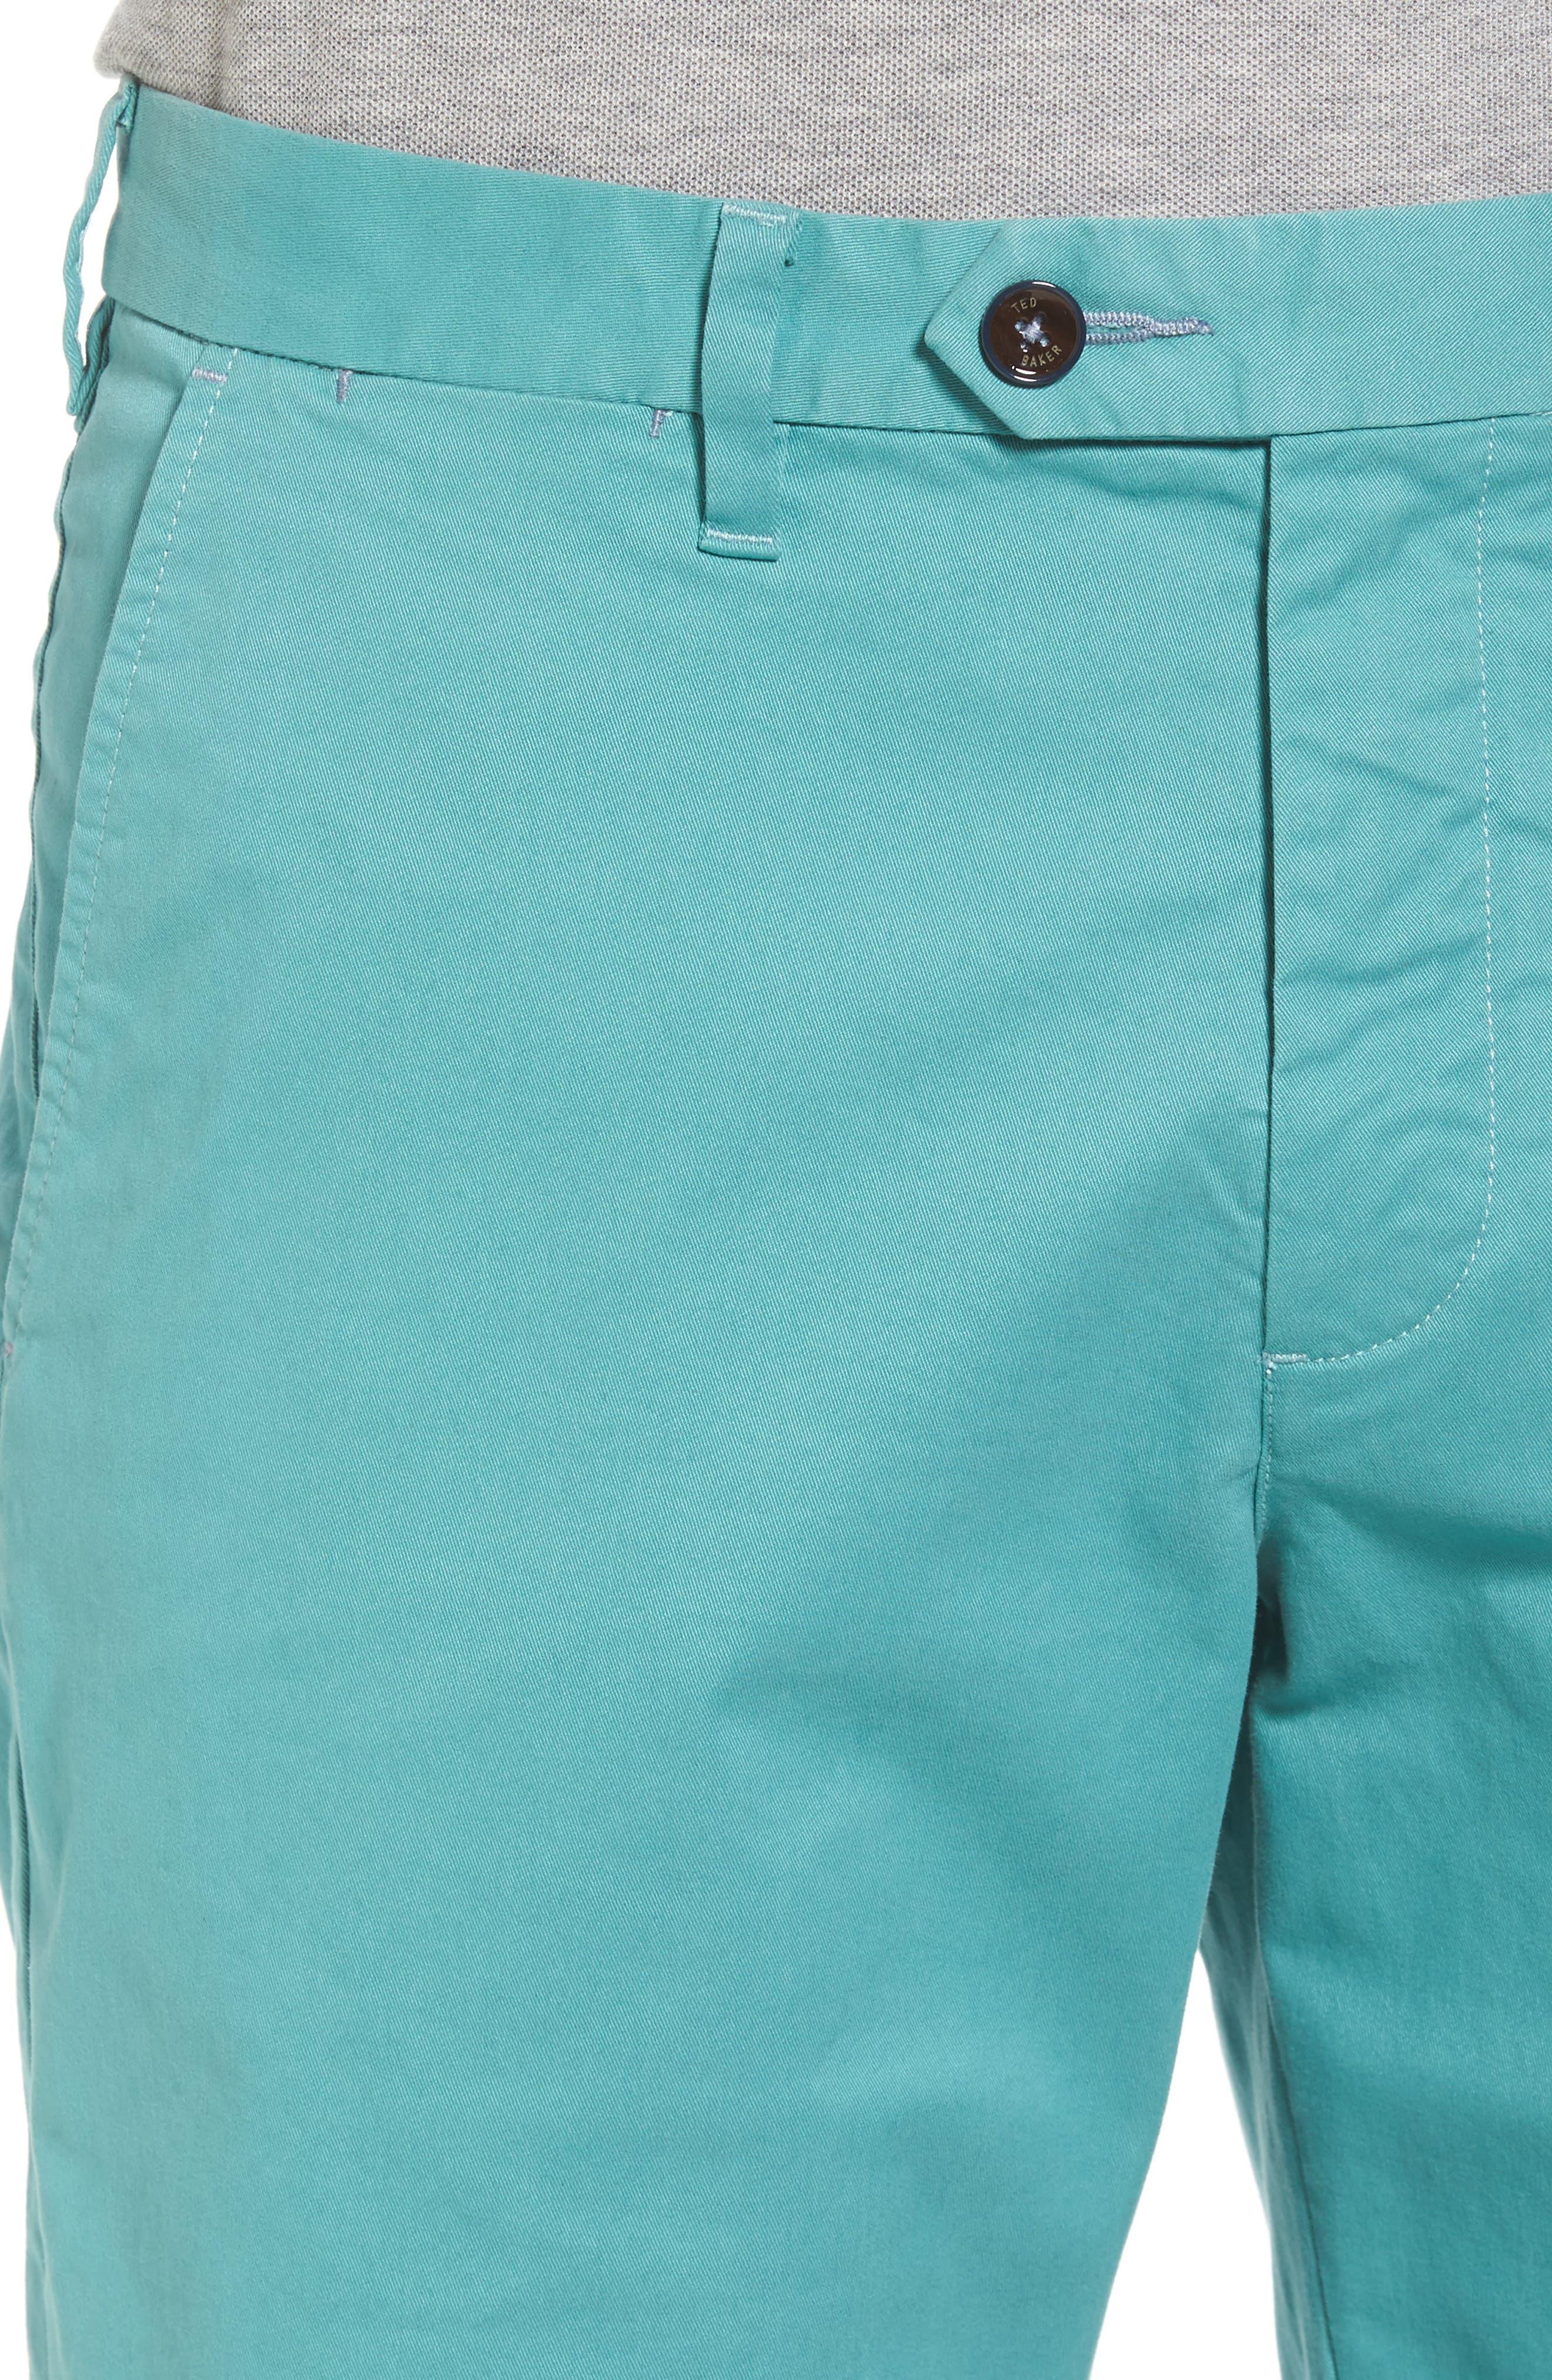 Proshtt Stretch Cotton Shorts,                             Alternate thumbnail 4, color,                             339